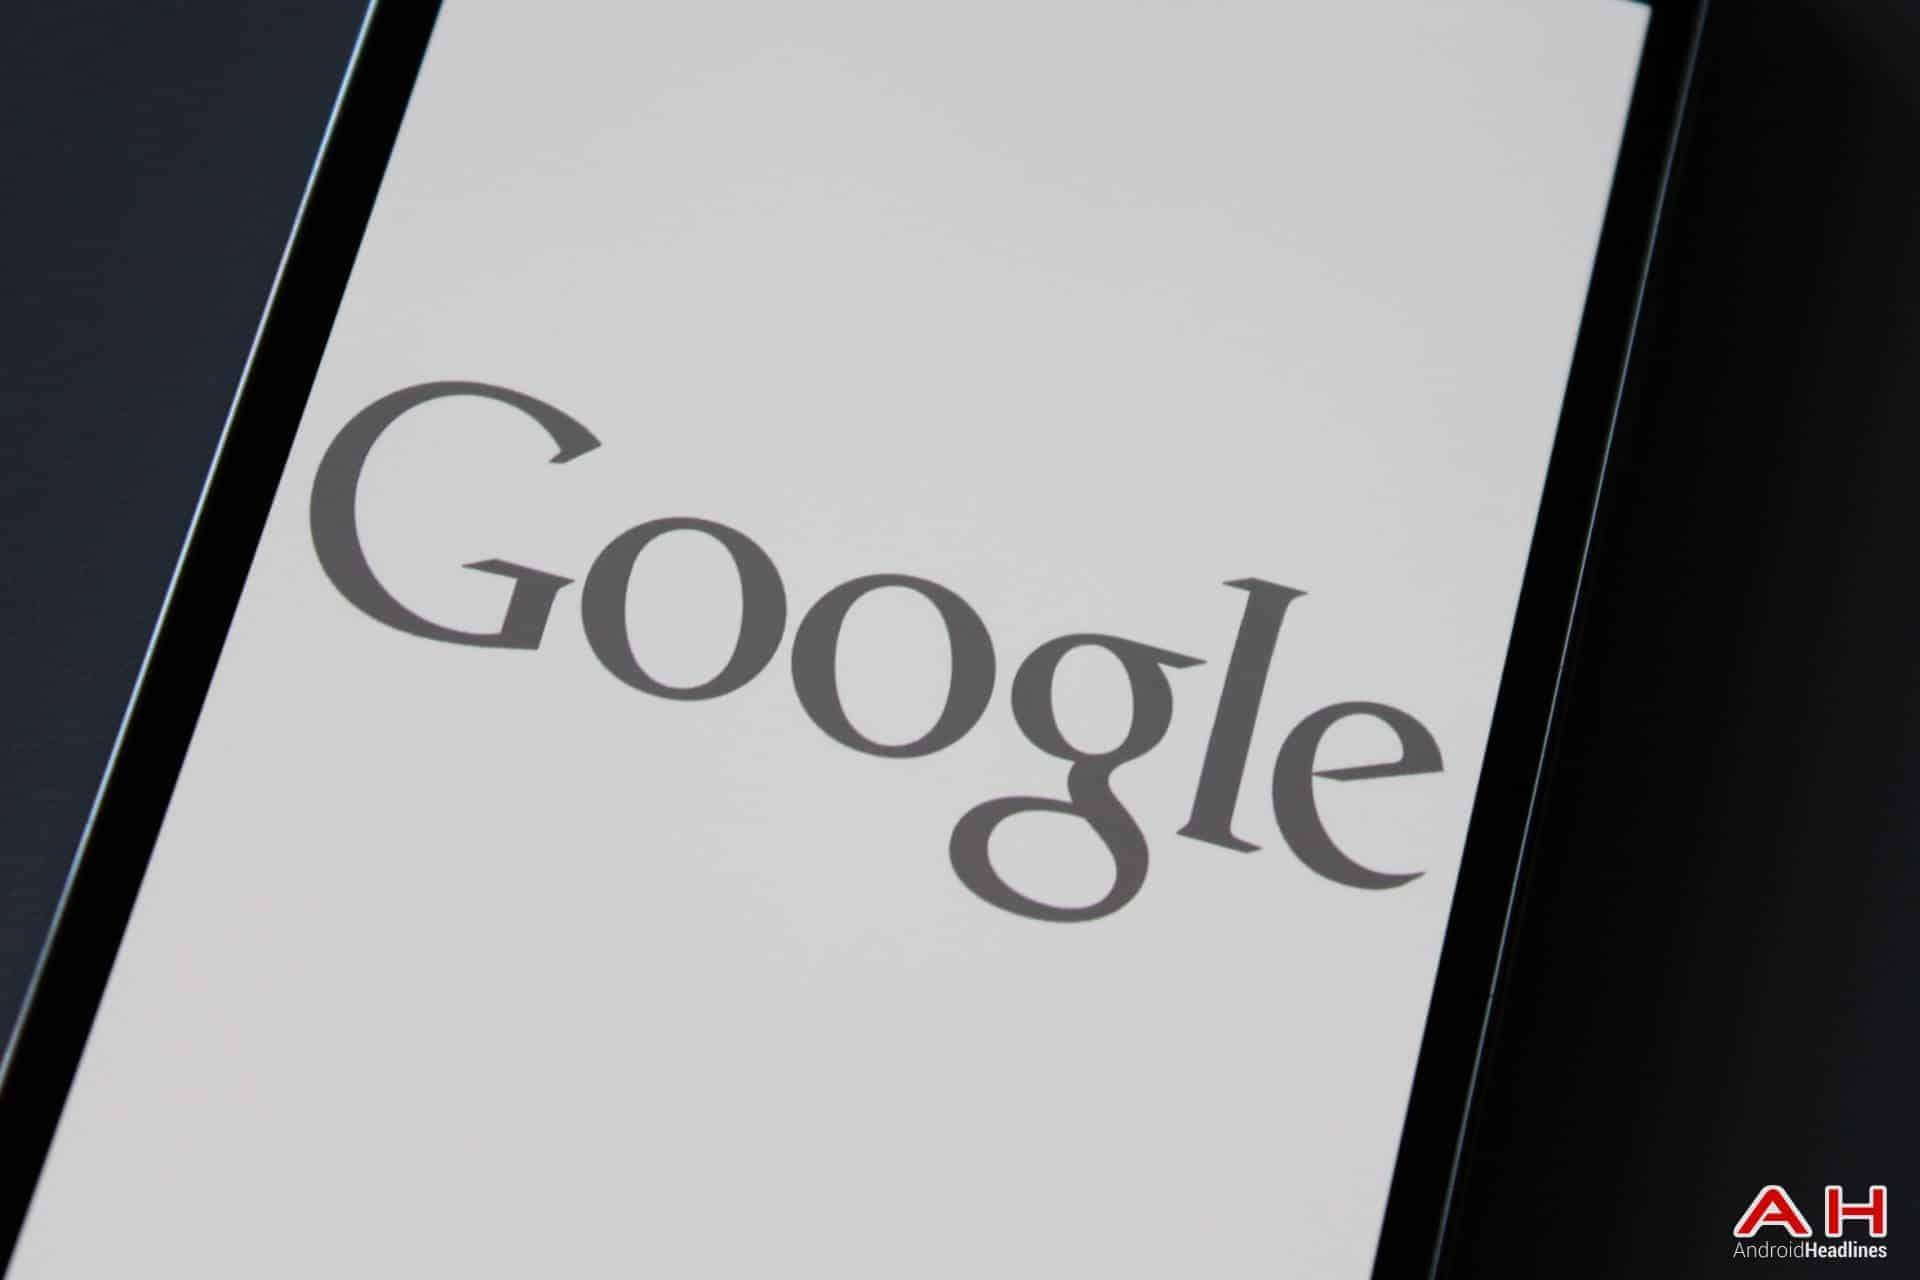 AH Google Logo White 1.2